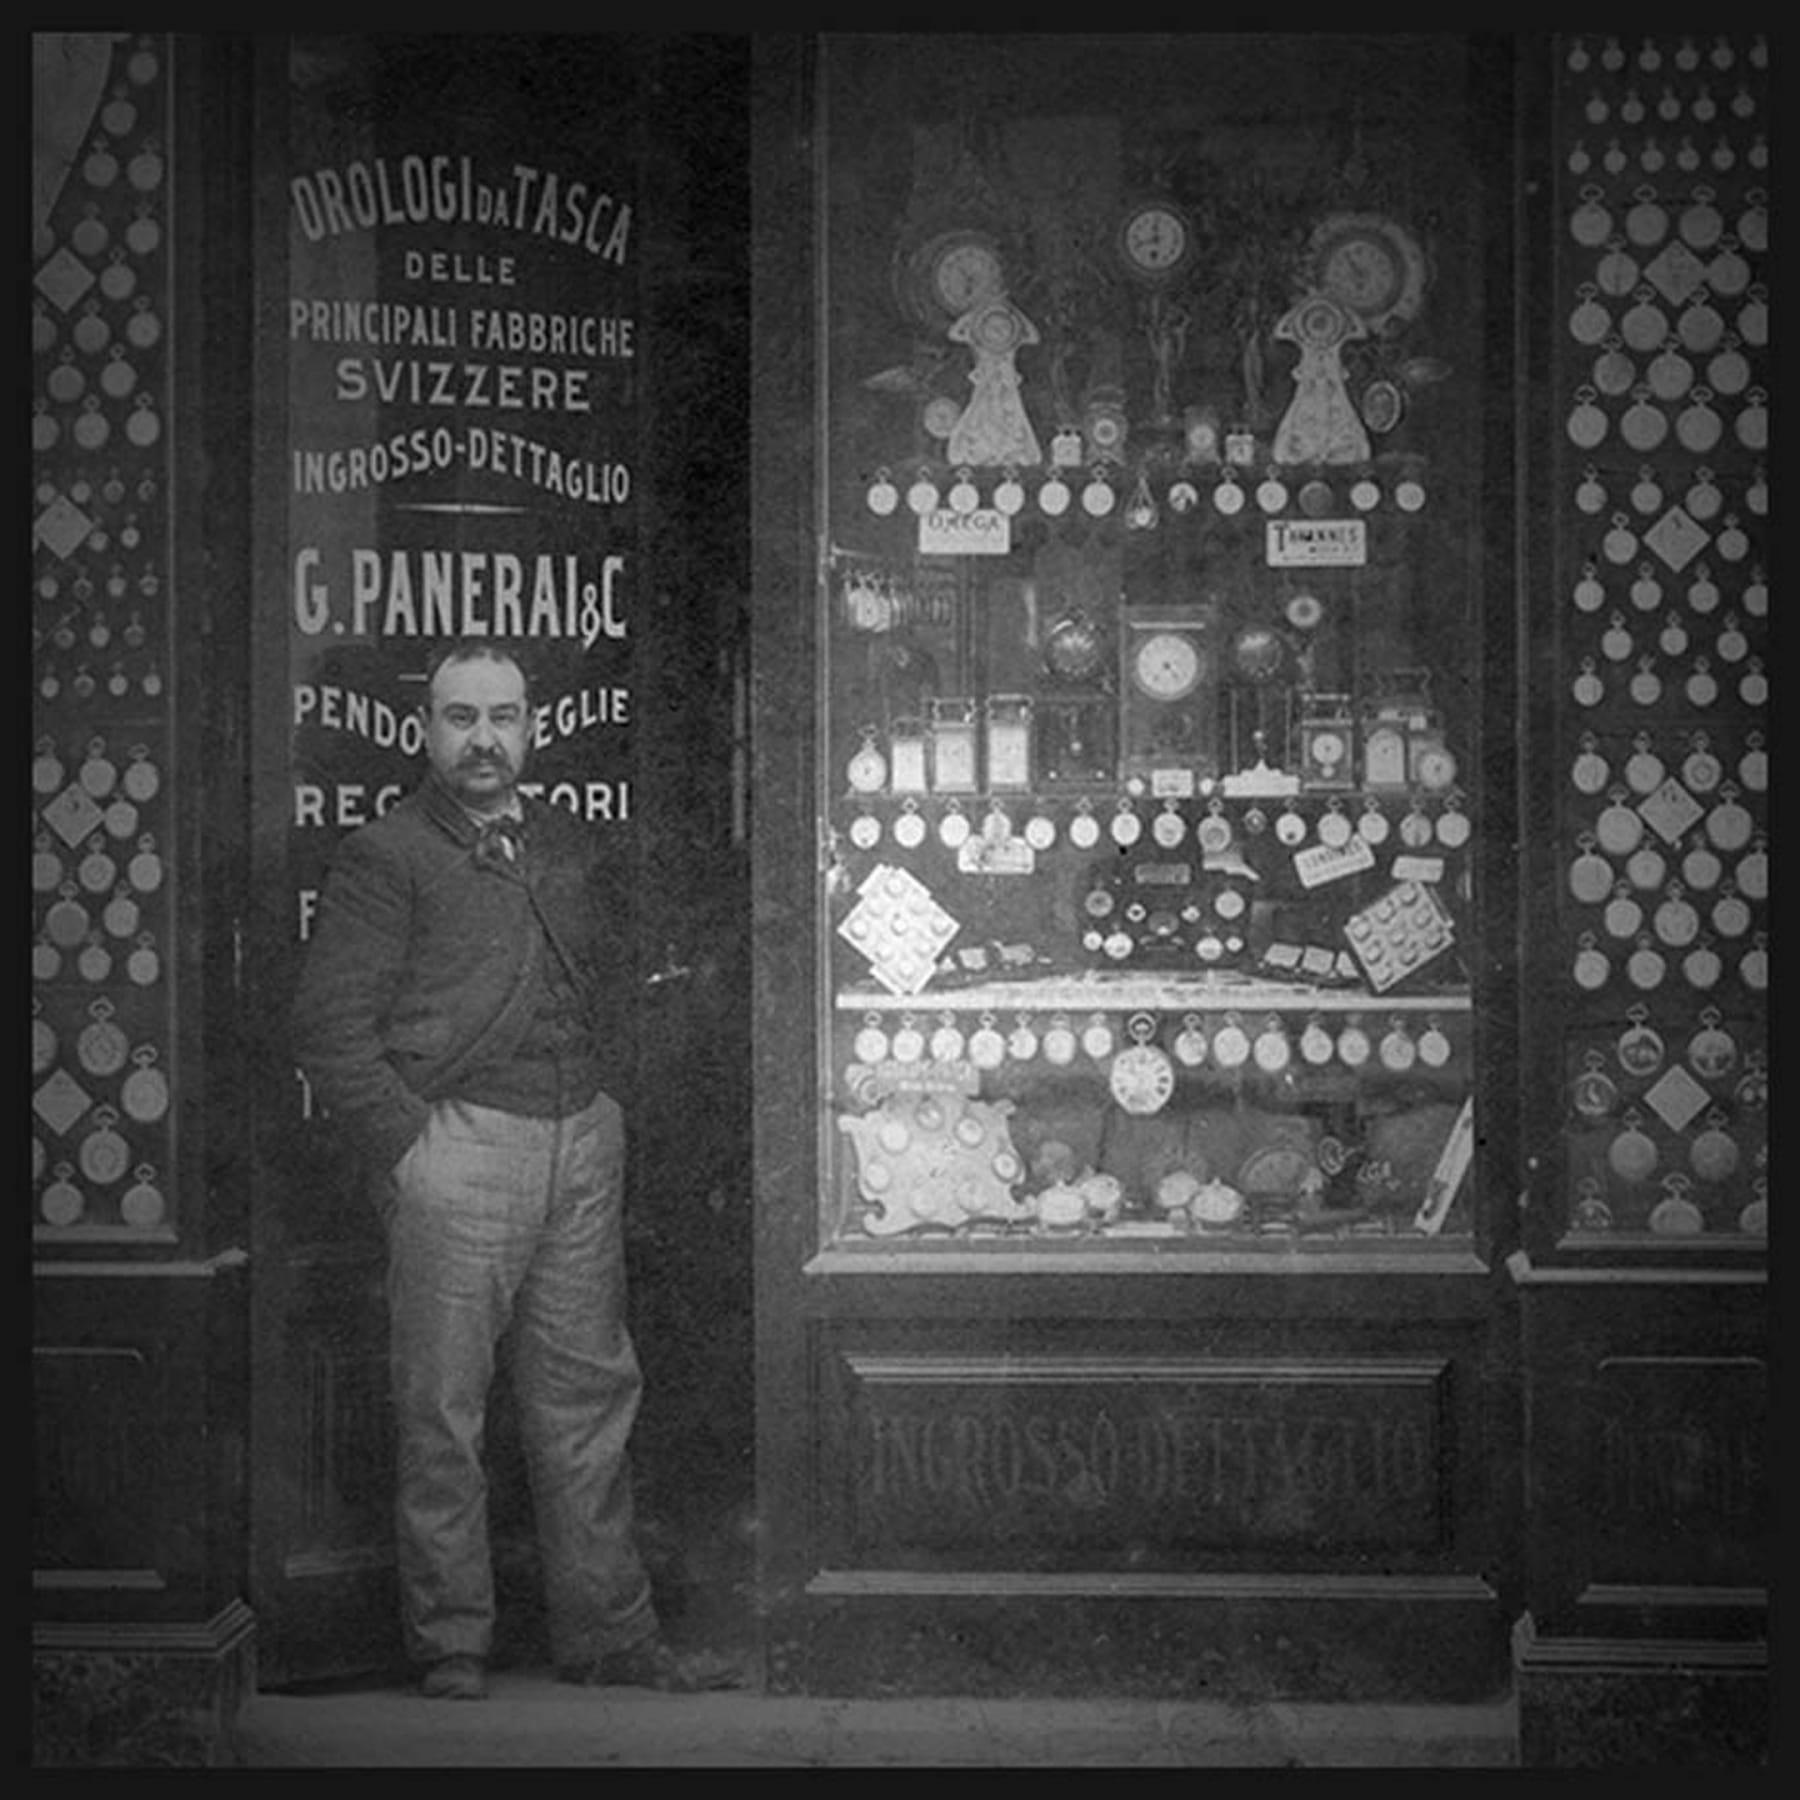 Panerai_1860-2